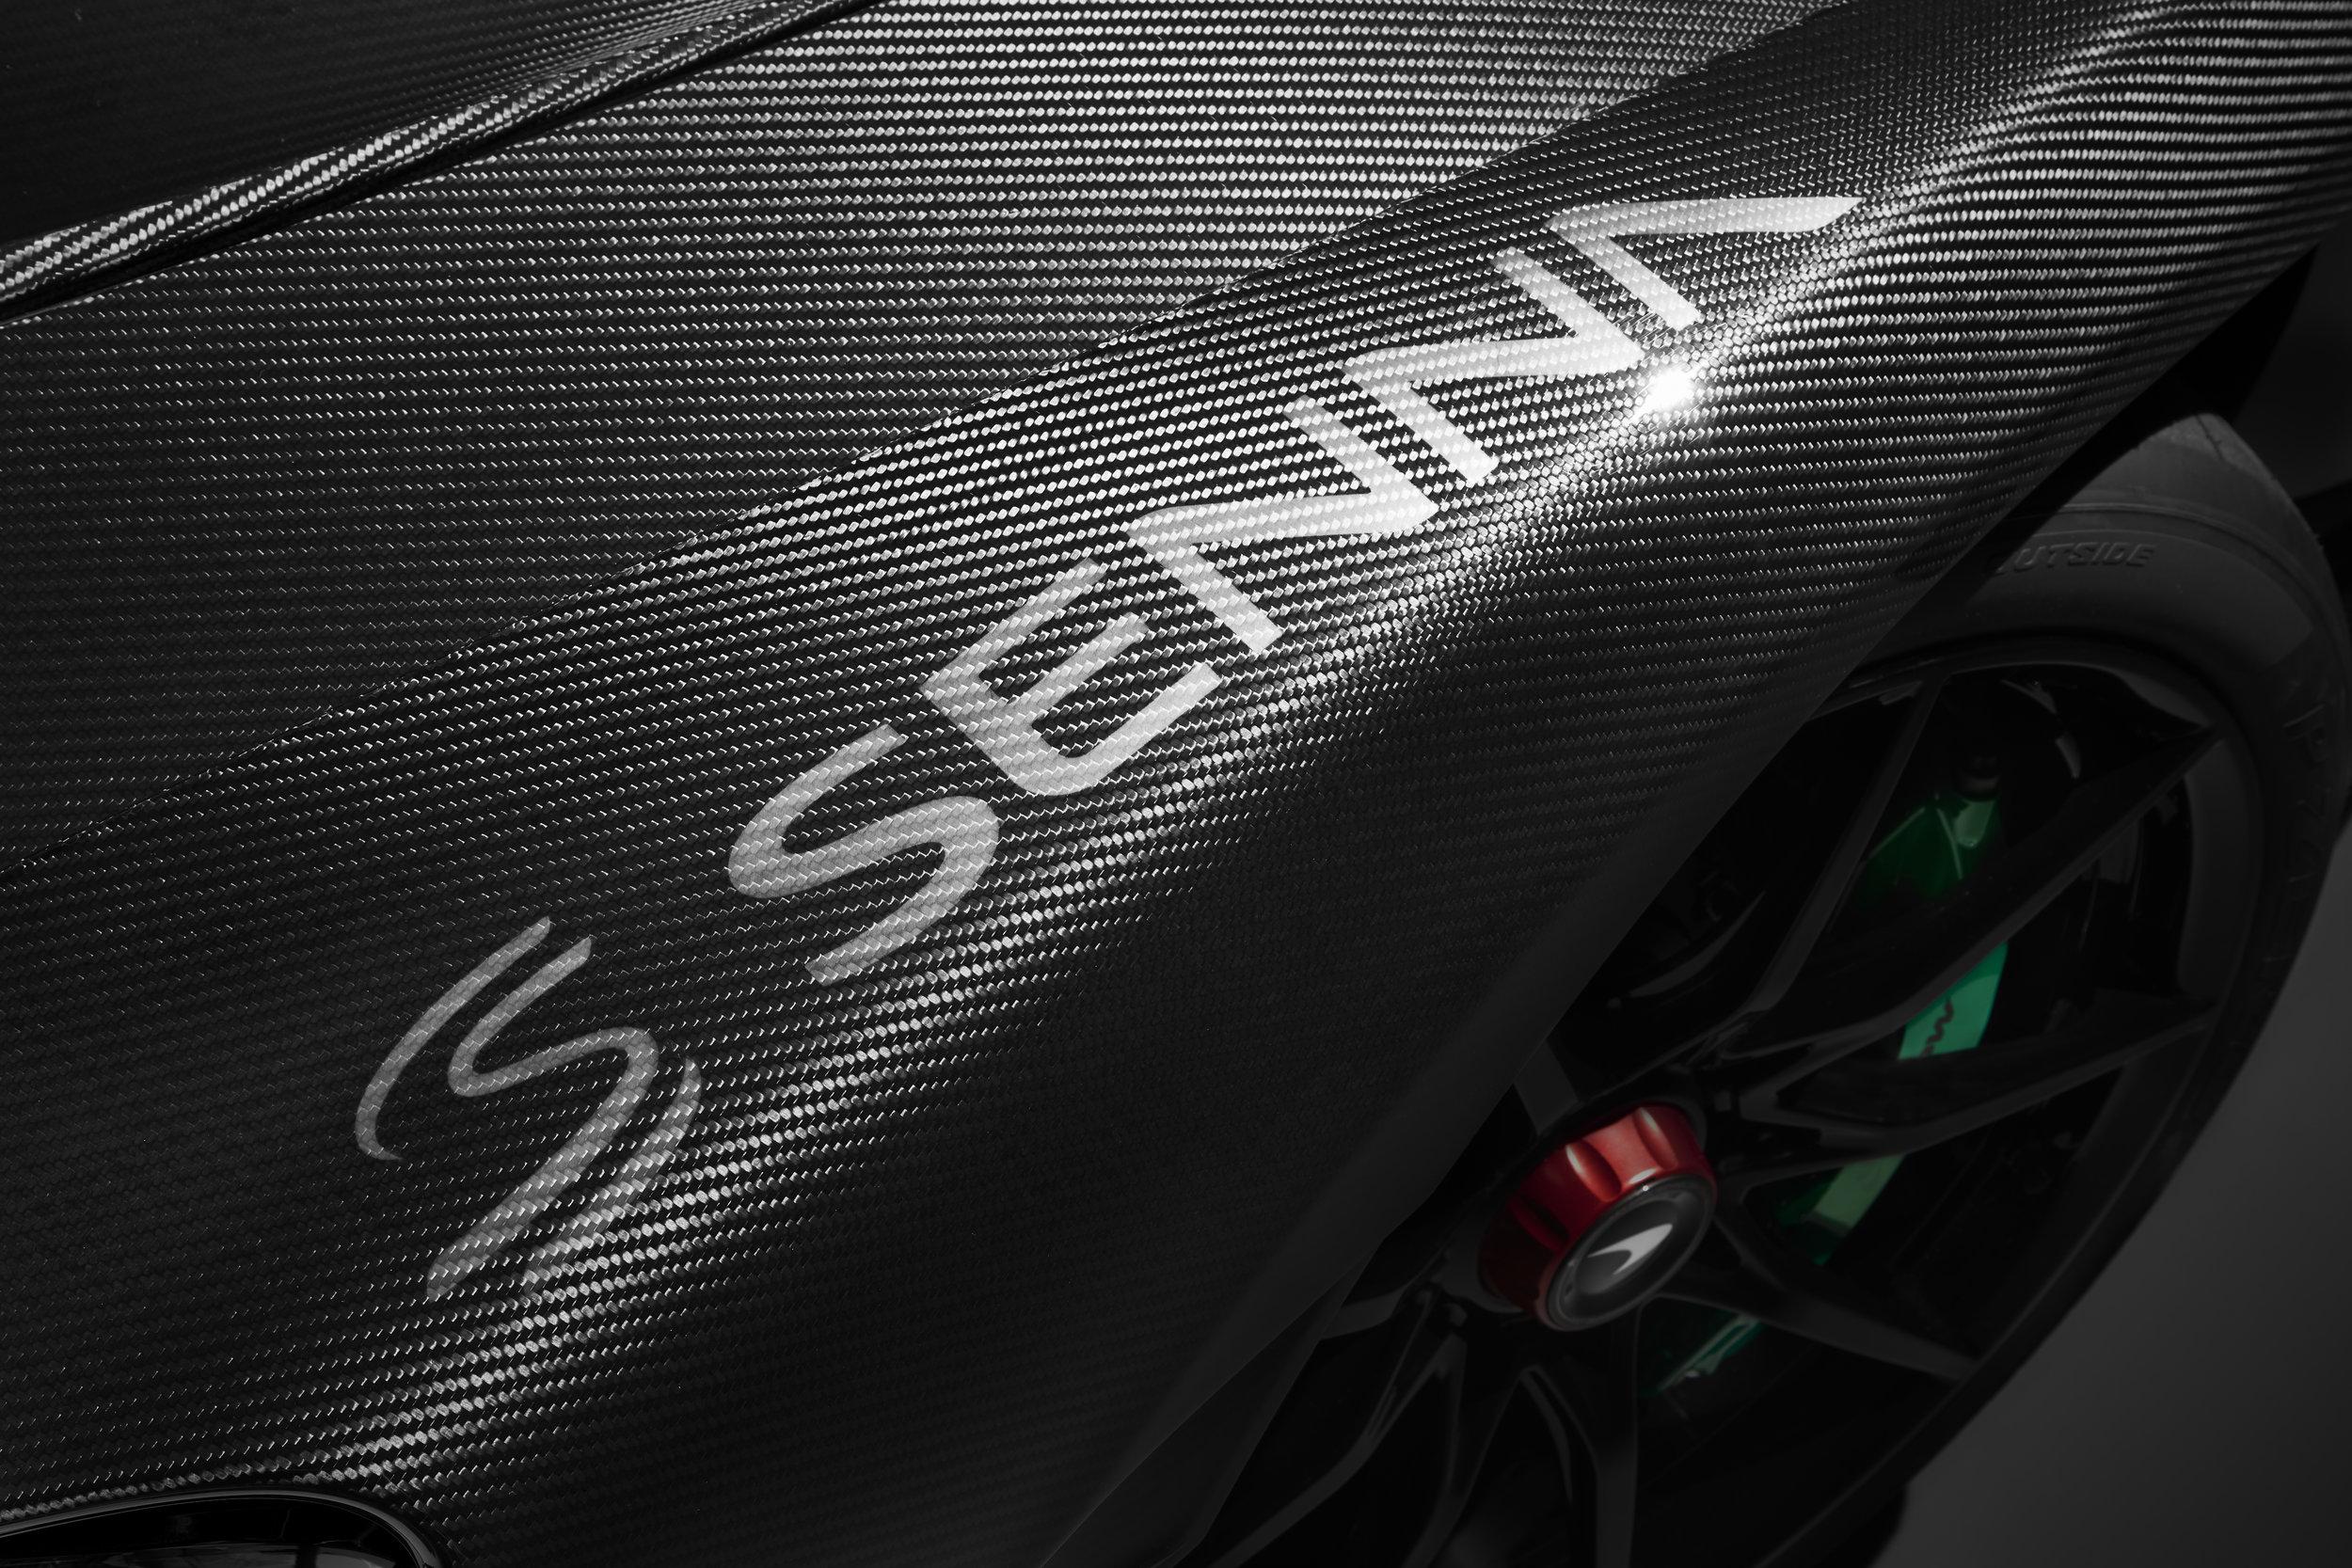 8955McLaren-Senna-Carbon-Theme-by-MSO_05.jpg